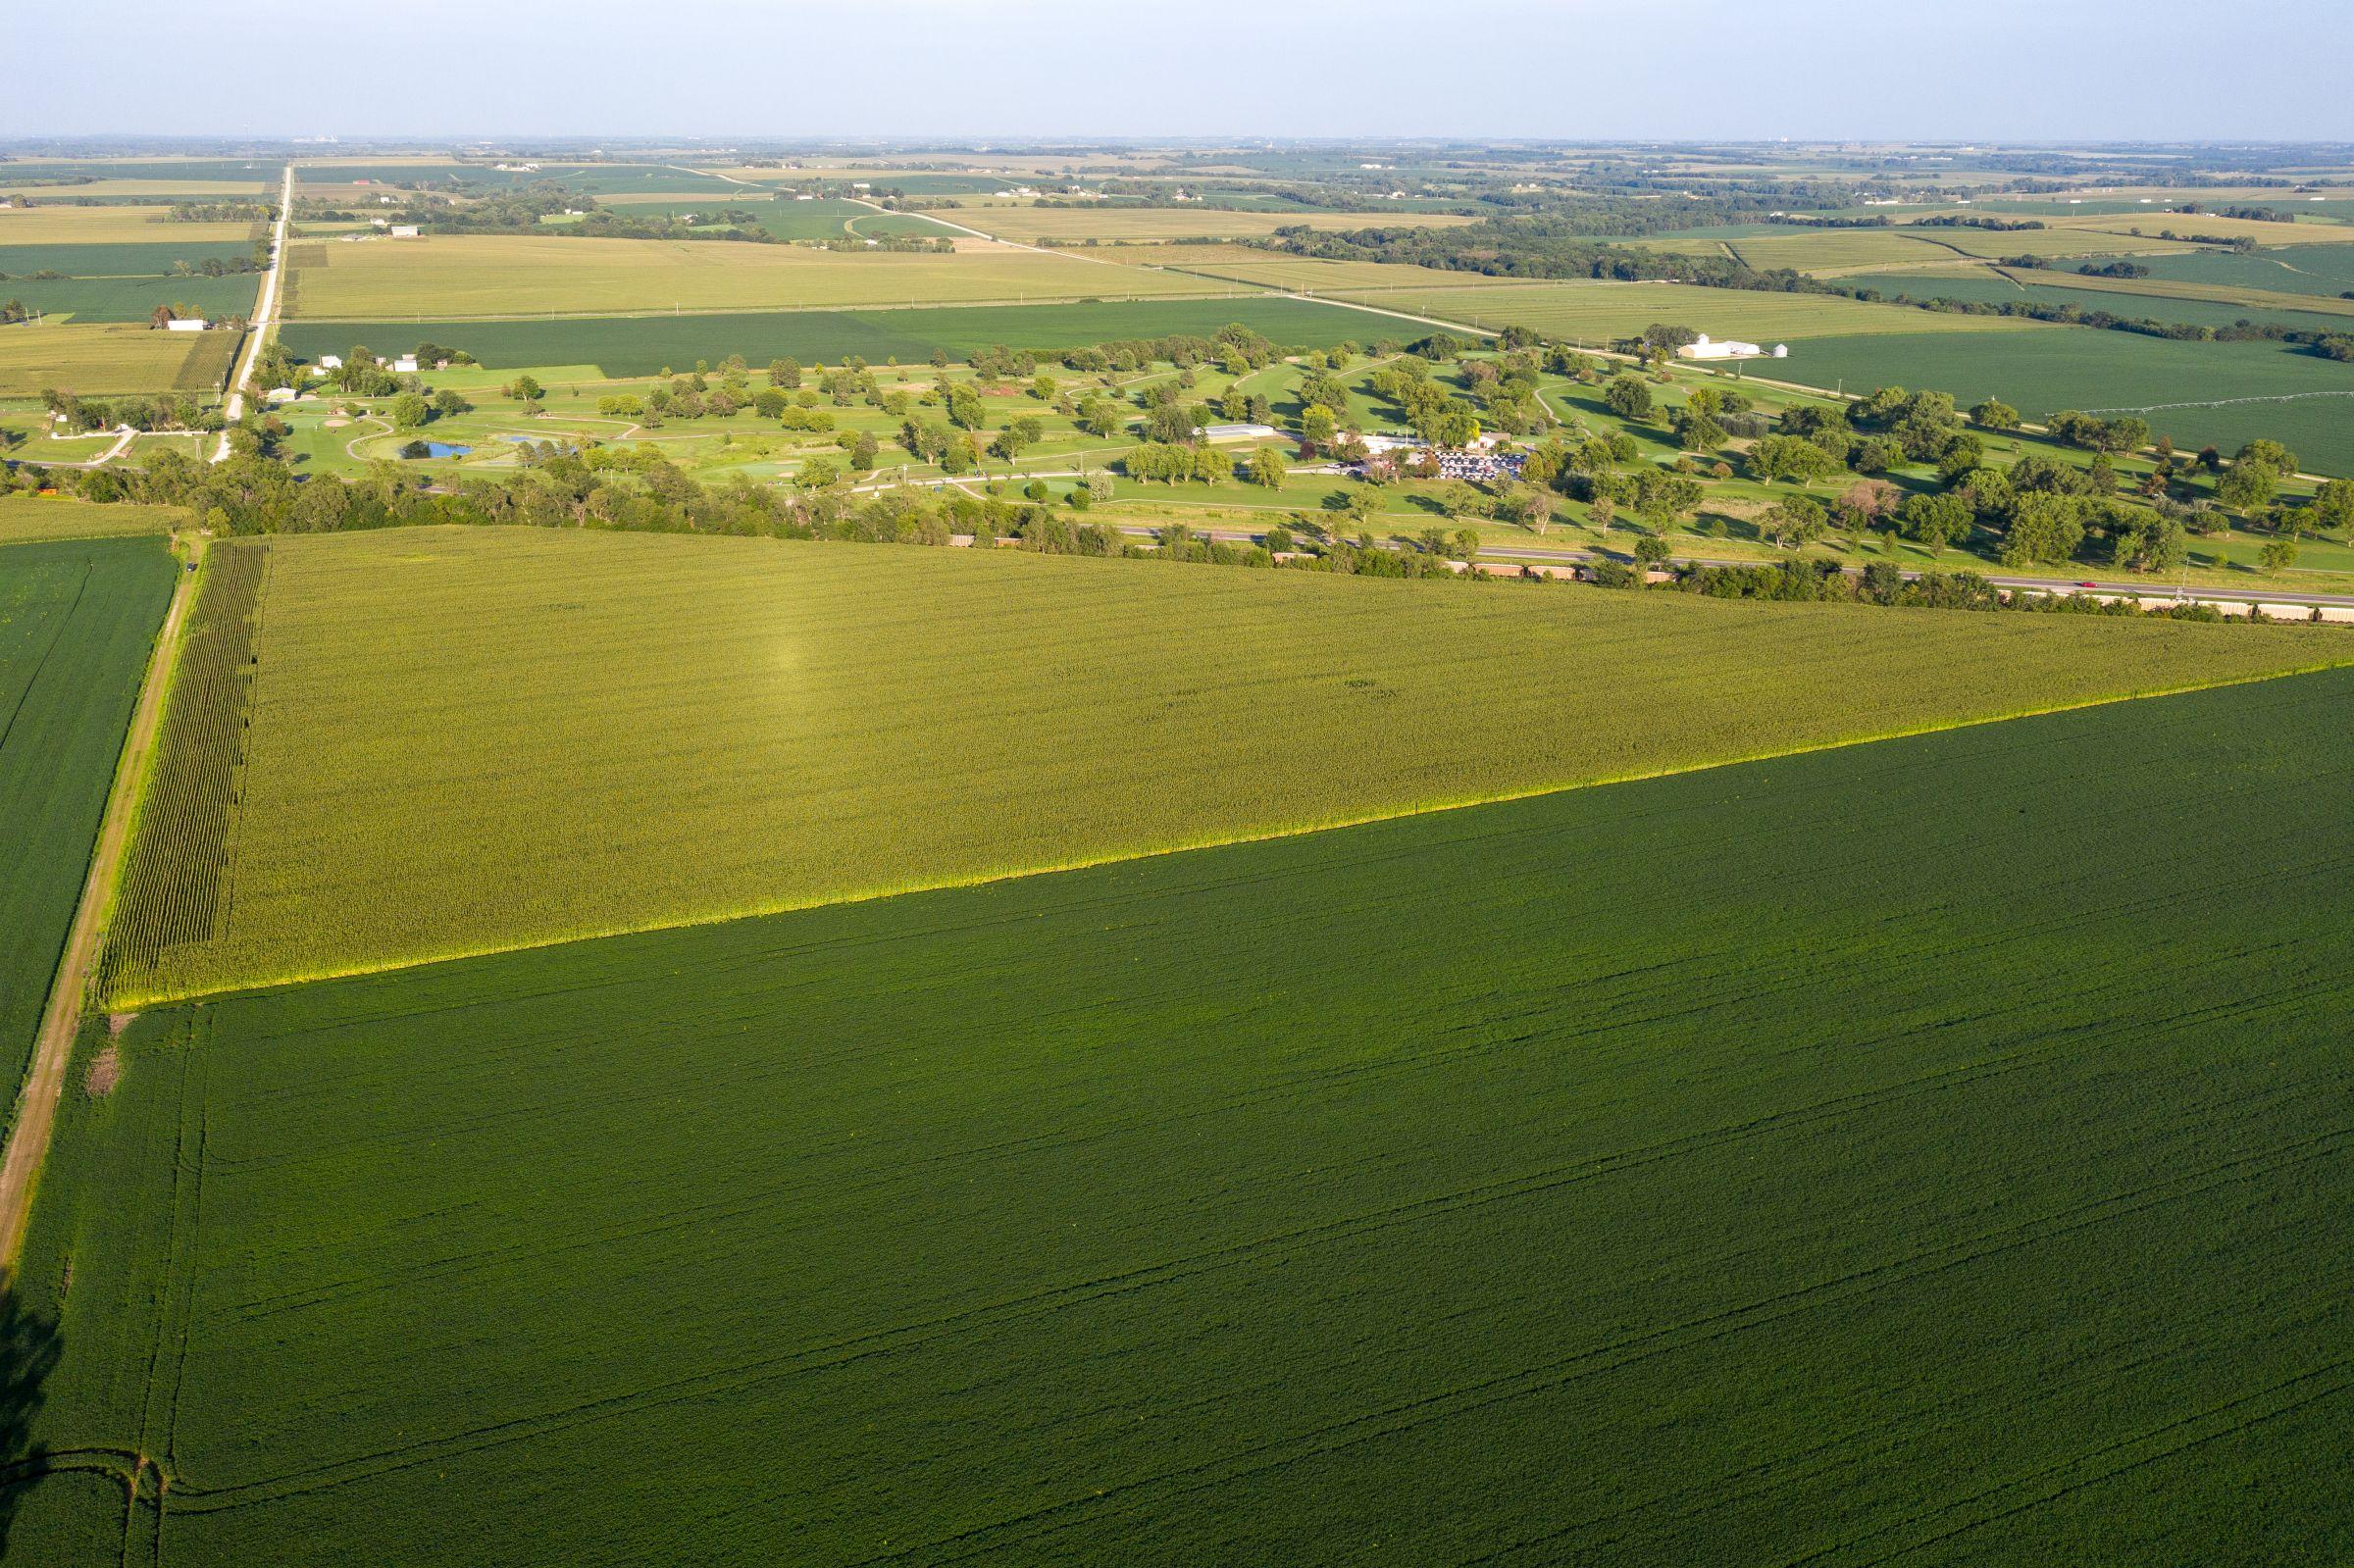 auctions-land-cass-county-nebraska-107-acres-listing-number-15713-2-2021-09-01-211254.jpeg